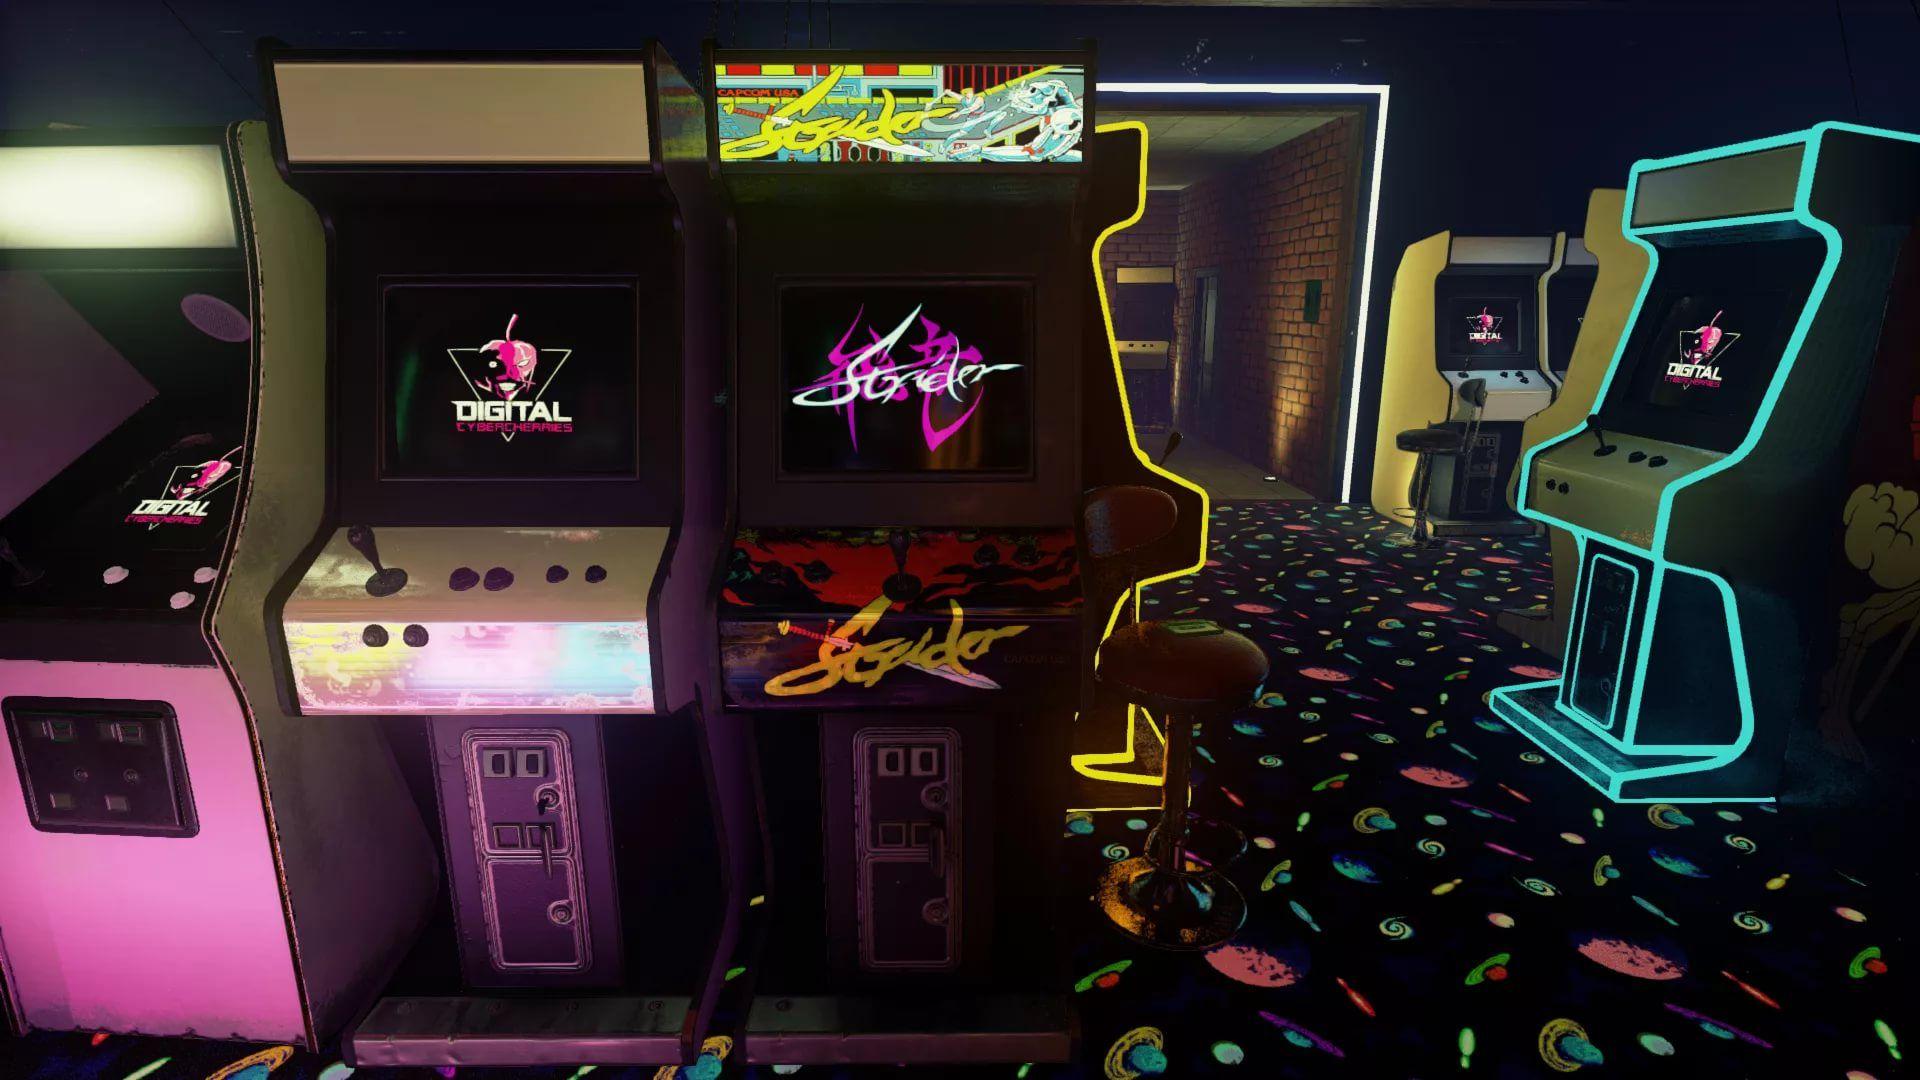 Arcade screen wallpaper